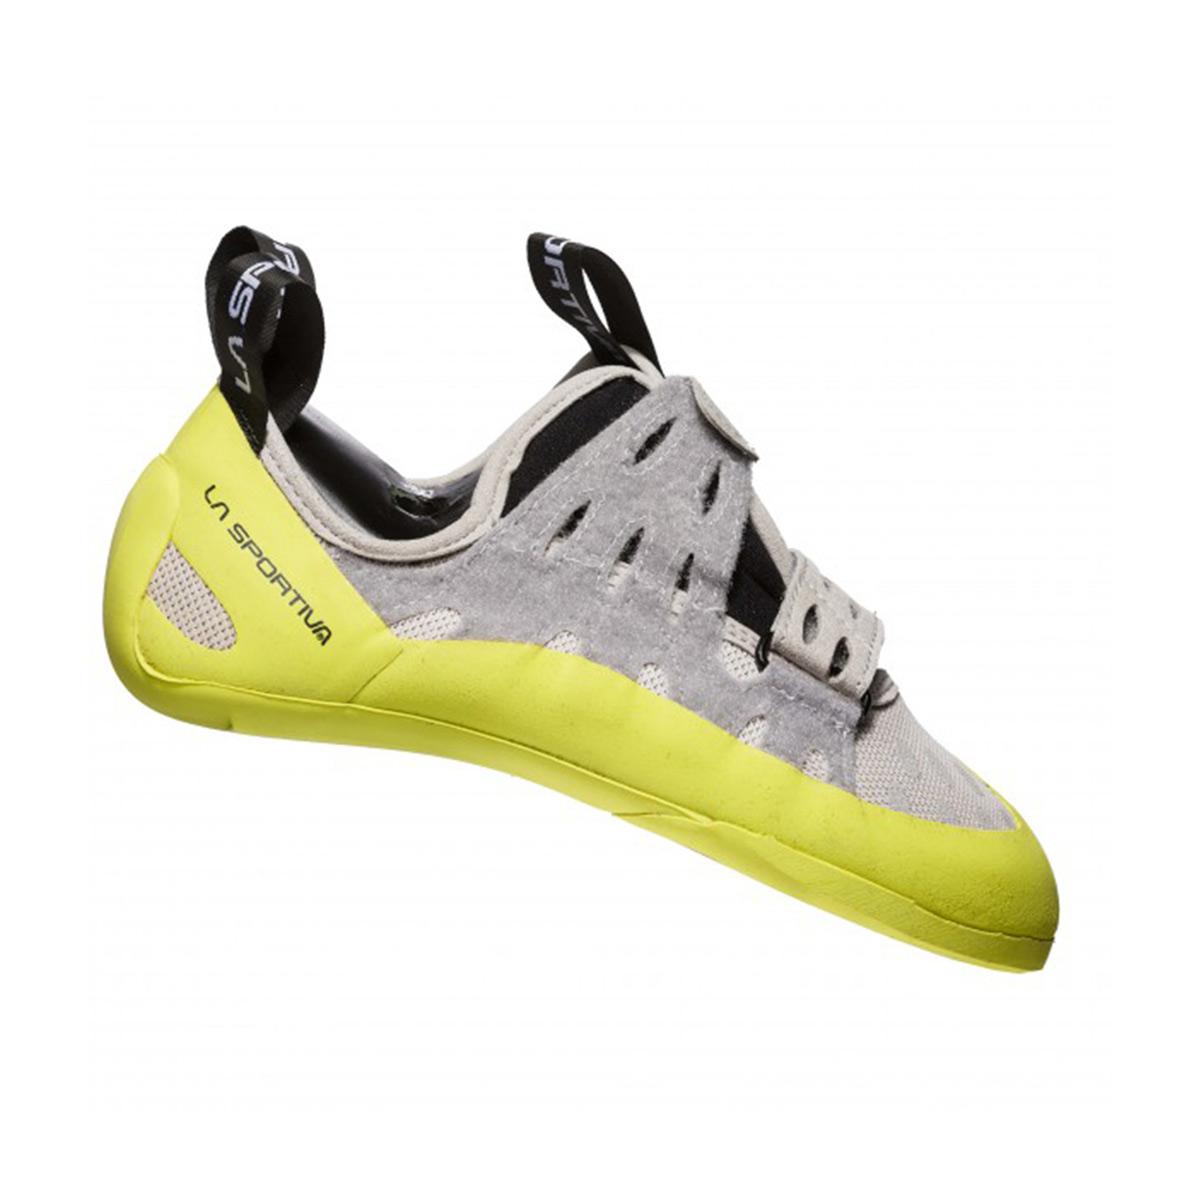 00fc66765ca4 La Sportiva GeckoGym Women s Climbing Shoe